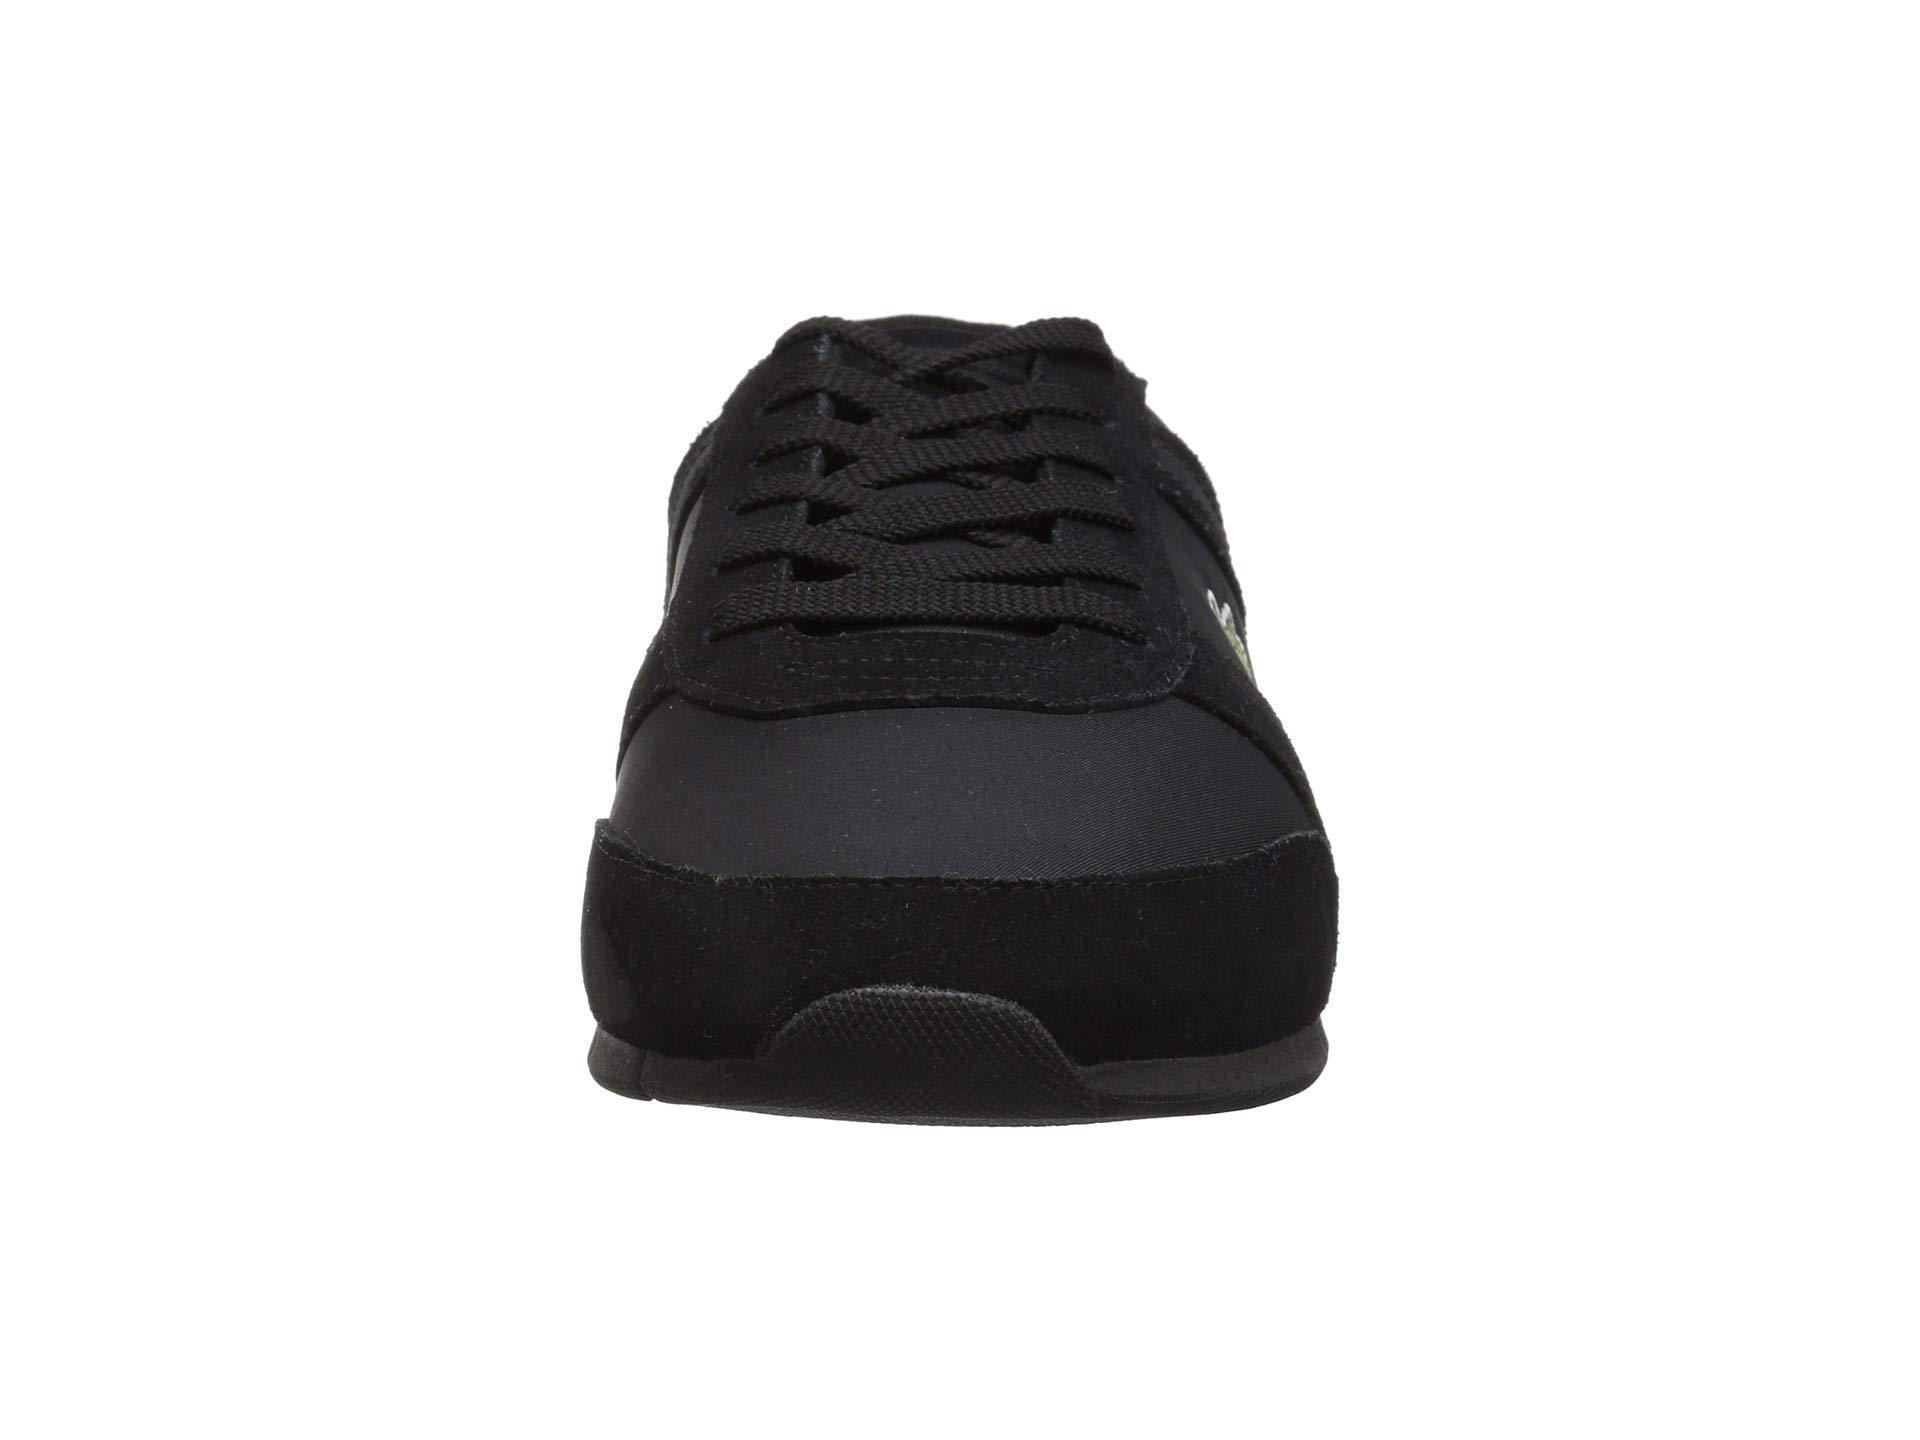 72ffca54c85f6a Lacoste - Menerva Sport 318 1 (black red) Men s Shoes for Men -. View  fullscreen